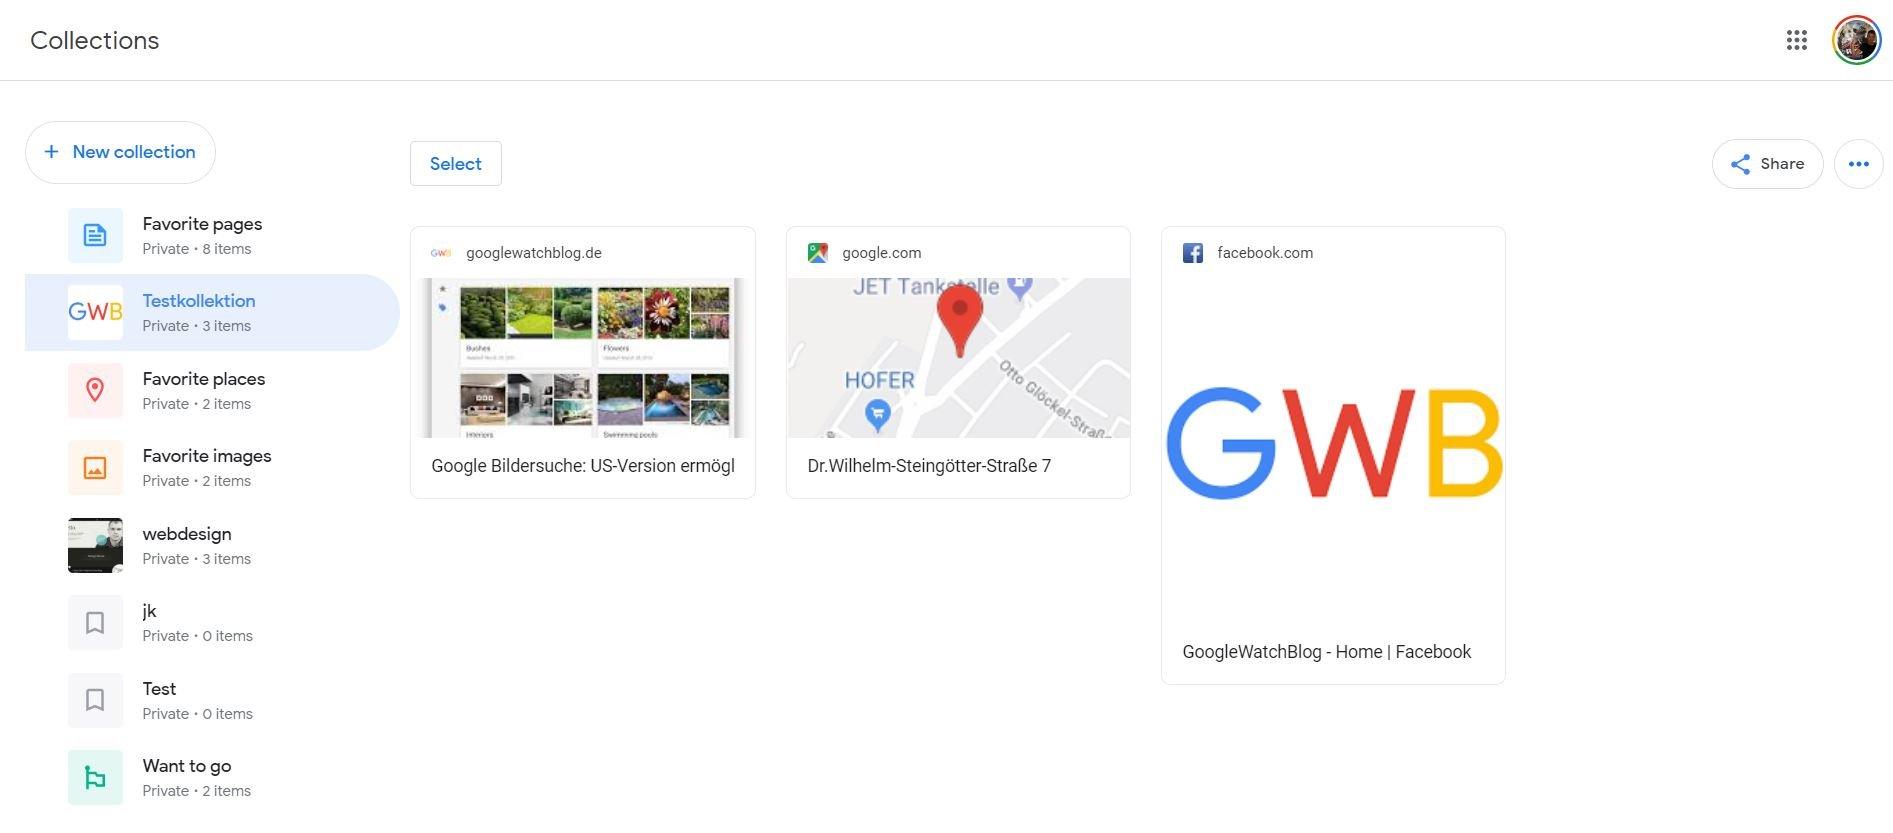 google collections screenshot